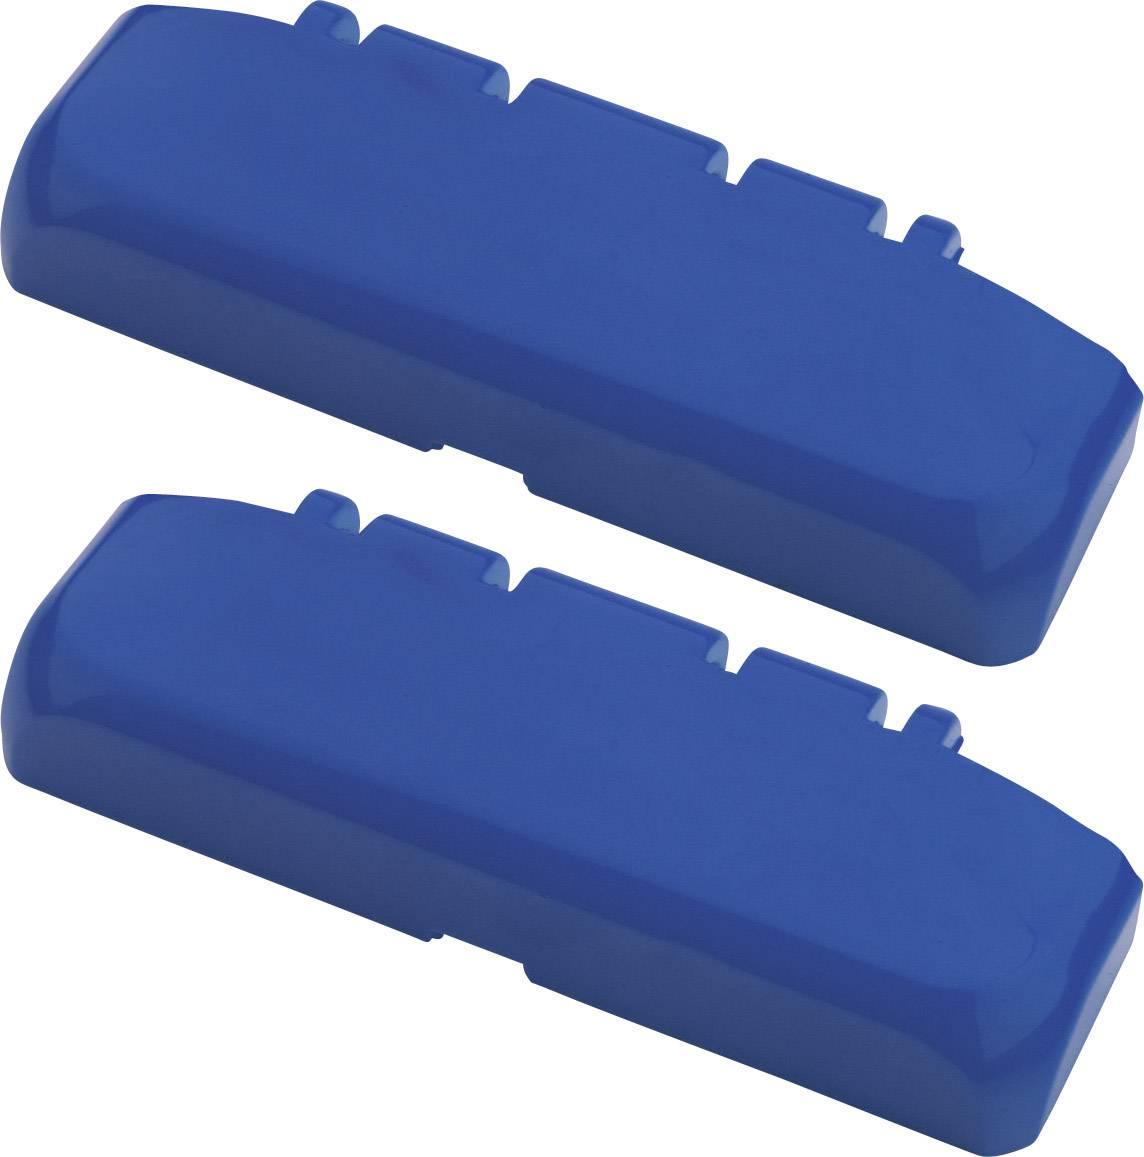 Bopla Bocube 96310102, polykarbonát, ultramarínová modrá, 2 ks